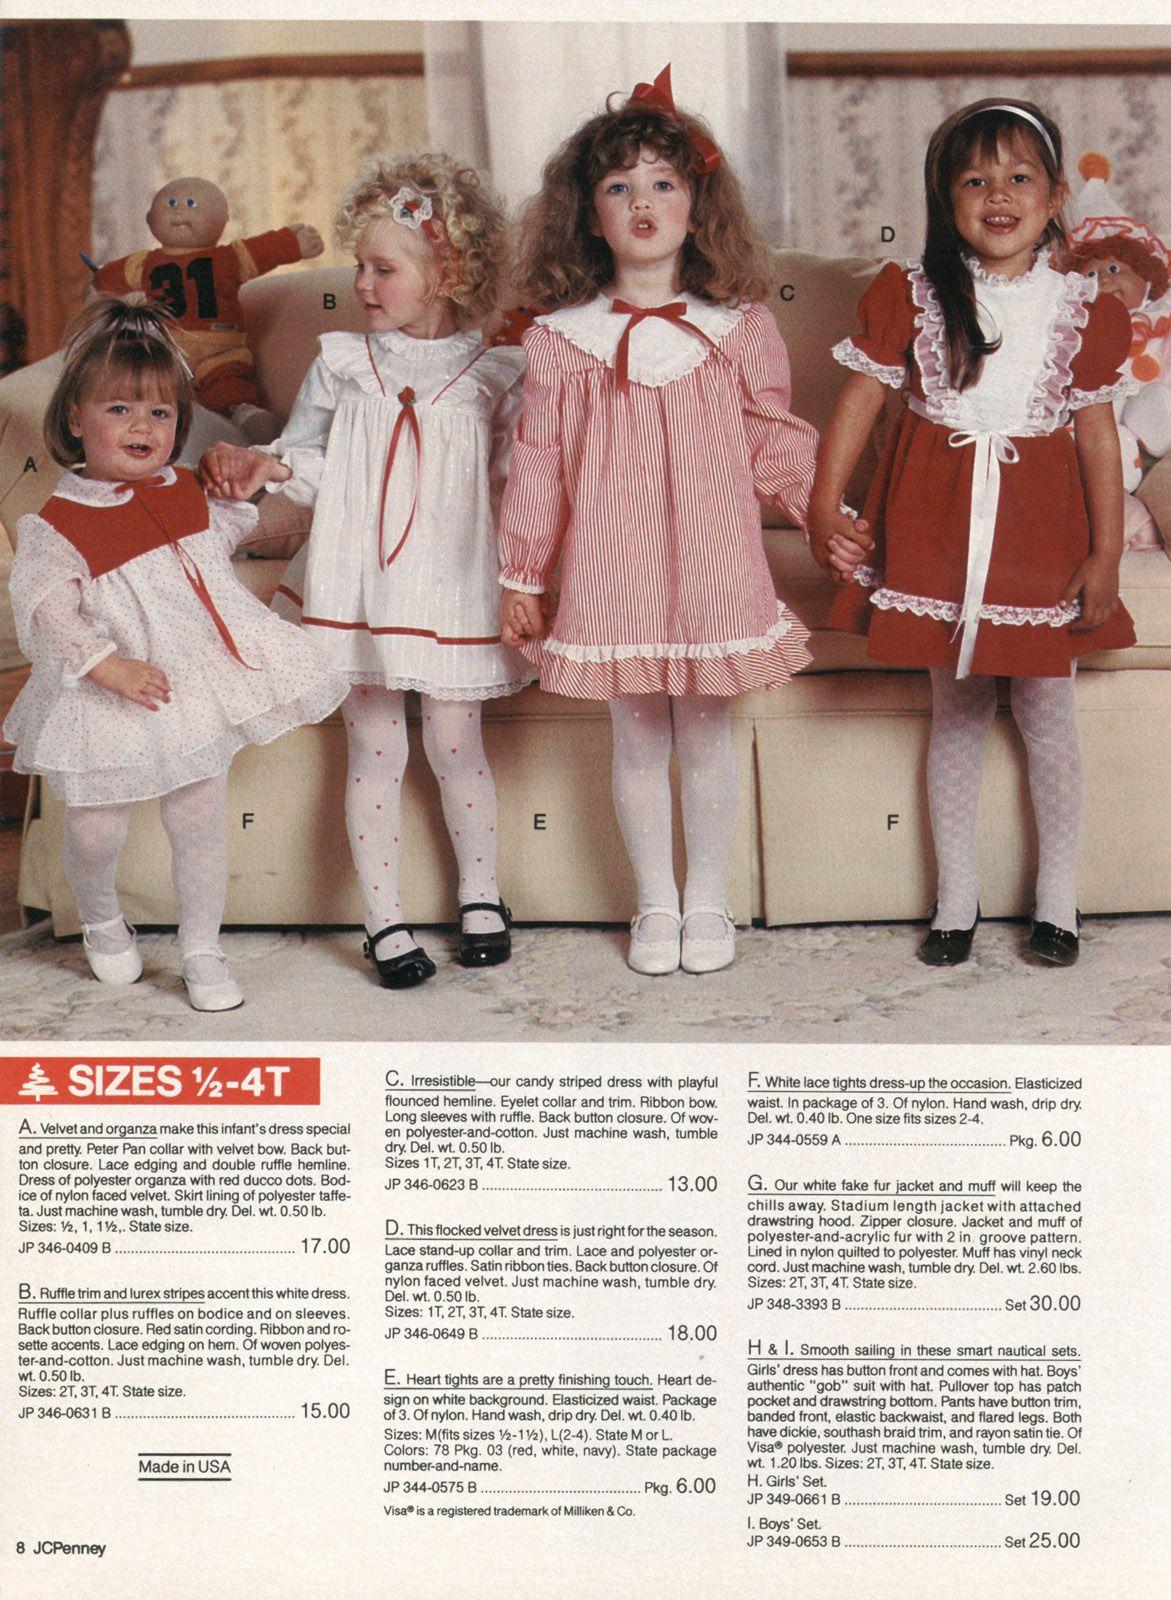 Jcpenney Christmas Catalog 2019 All sizes | 1986 xx xx JCPenney Christmas Catalog P008 | Flickr